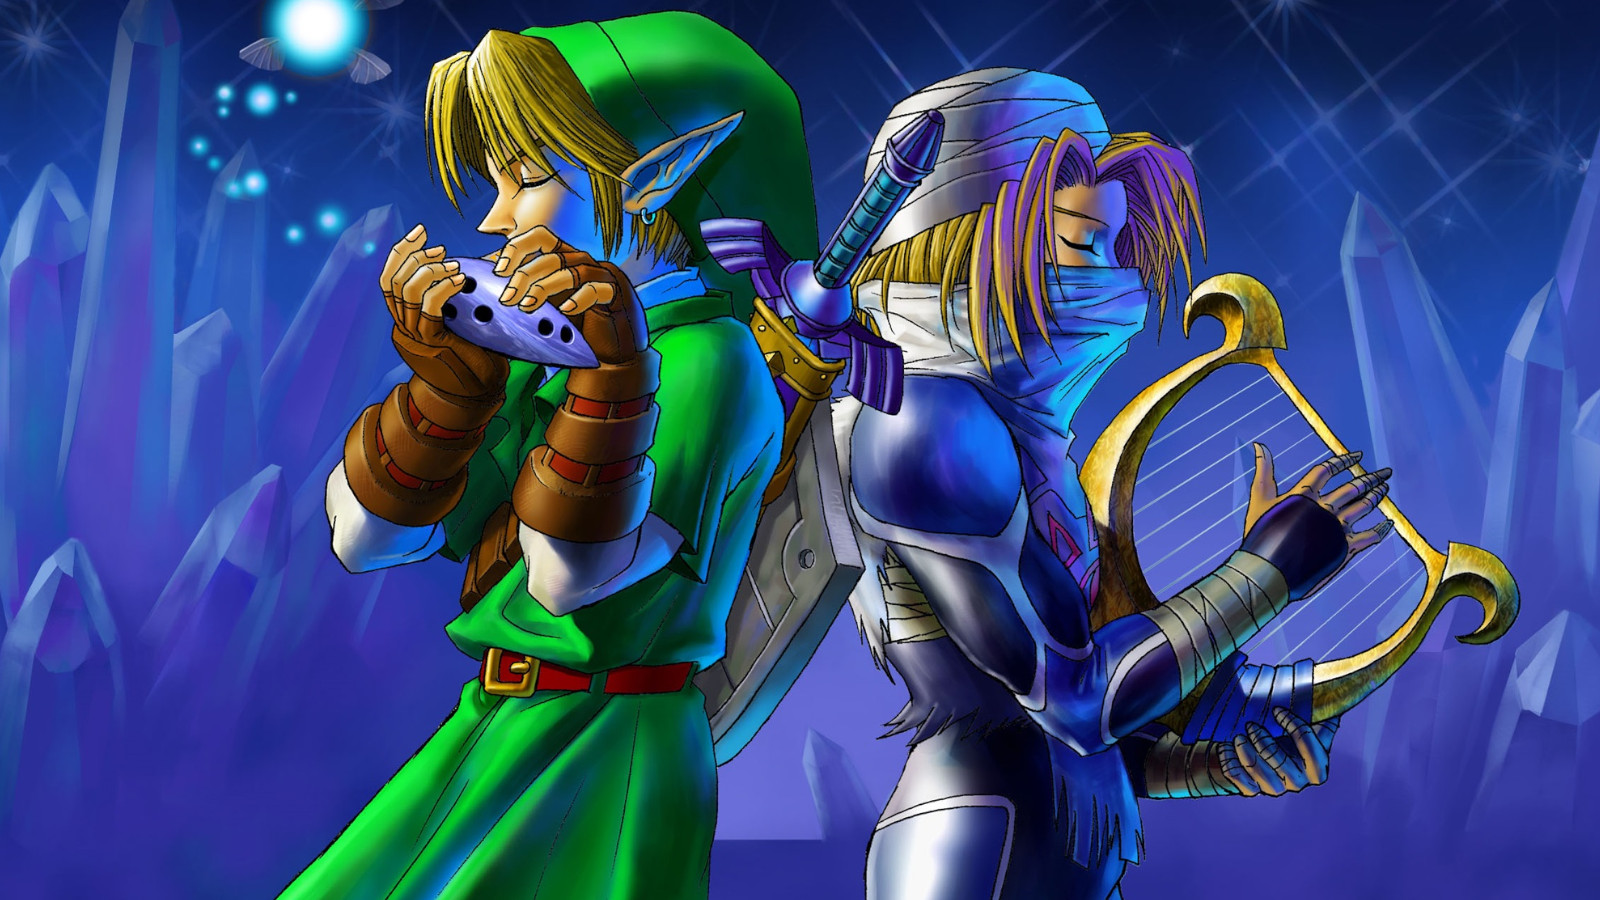 Link and Sheik Ocarina of Time